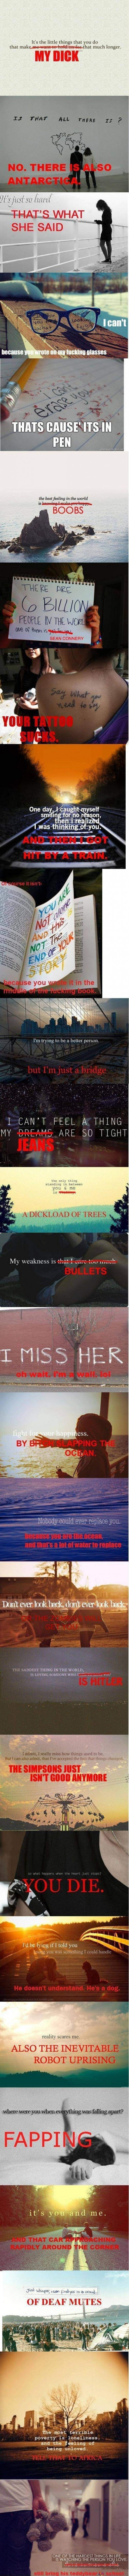 Tumblr Trolling. please thumb .. OP is a fag